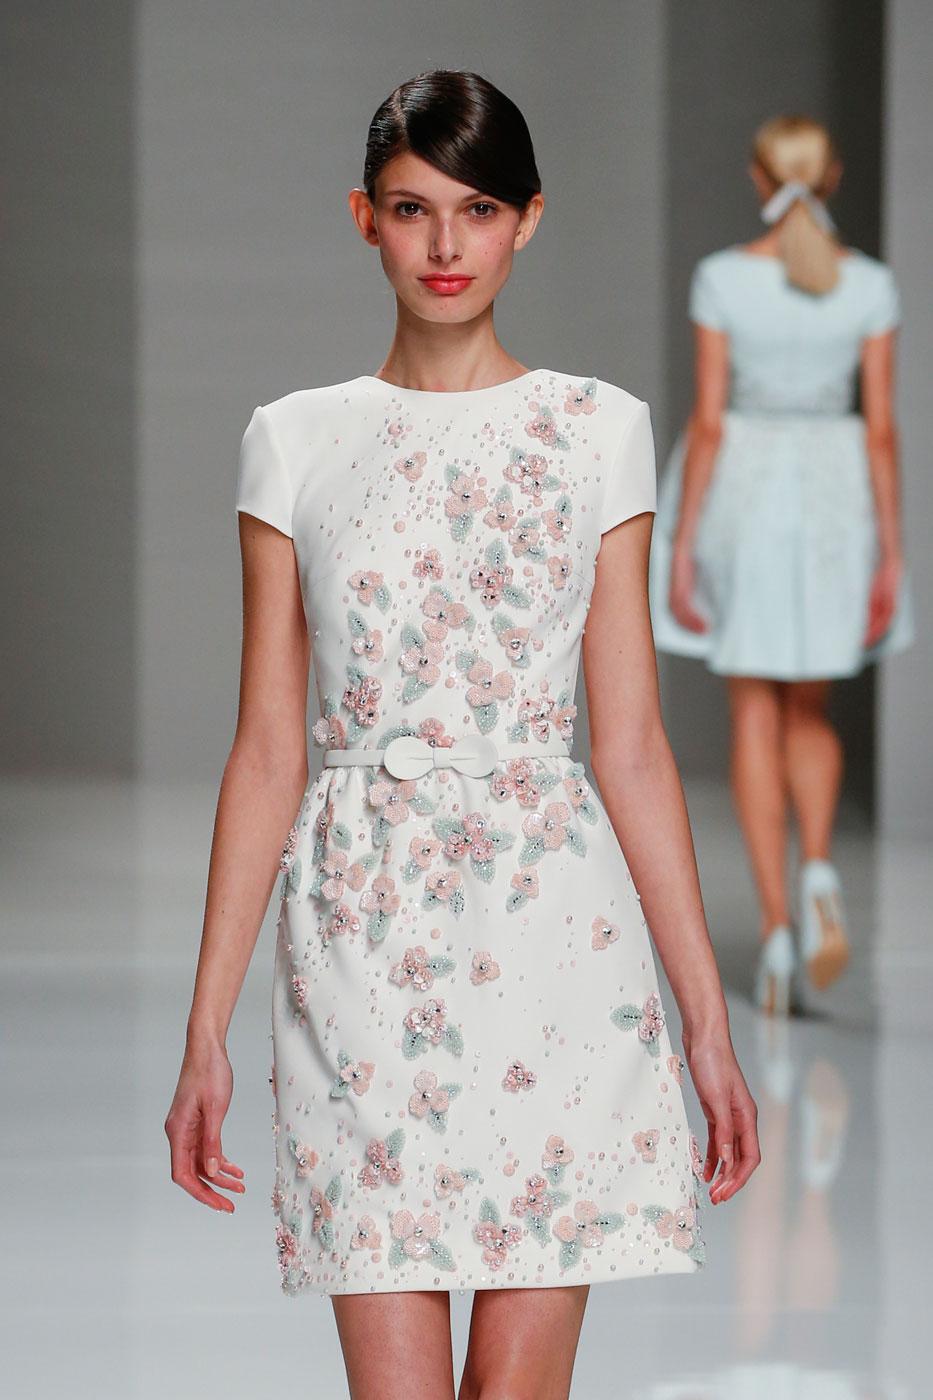 Georges-Hobeika-fashion-runway-show-haute-couture-paris-spring-2015-the-impression-06